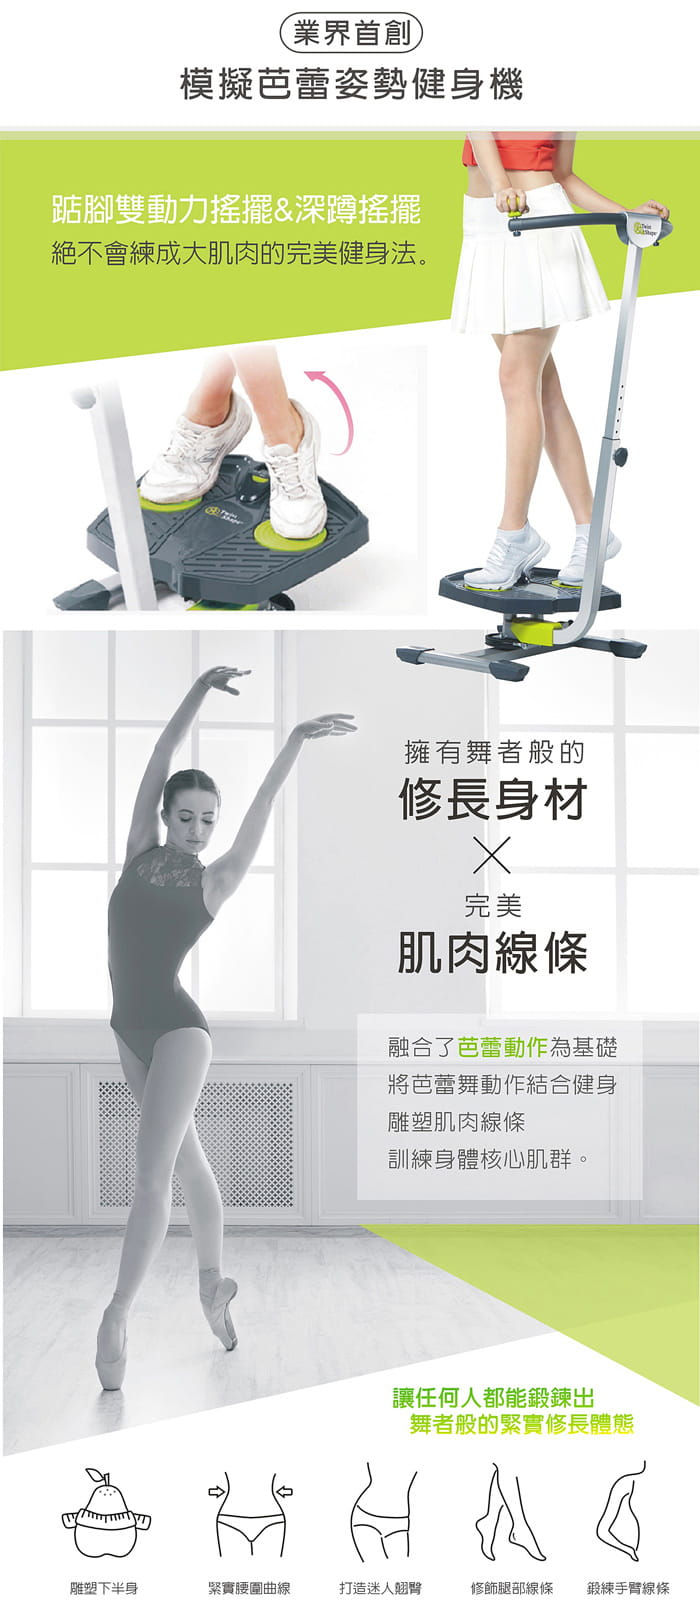 Twist&Shape曲線搖擺健腹機 折疊版 保固一年  贈綠色有氧瑜珈墊 6